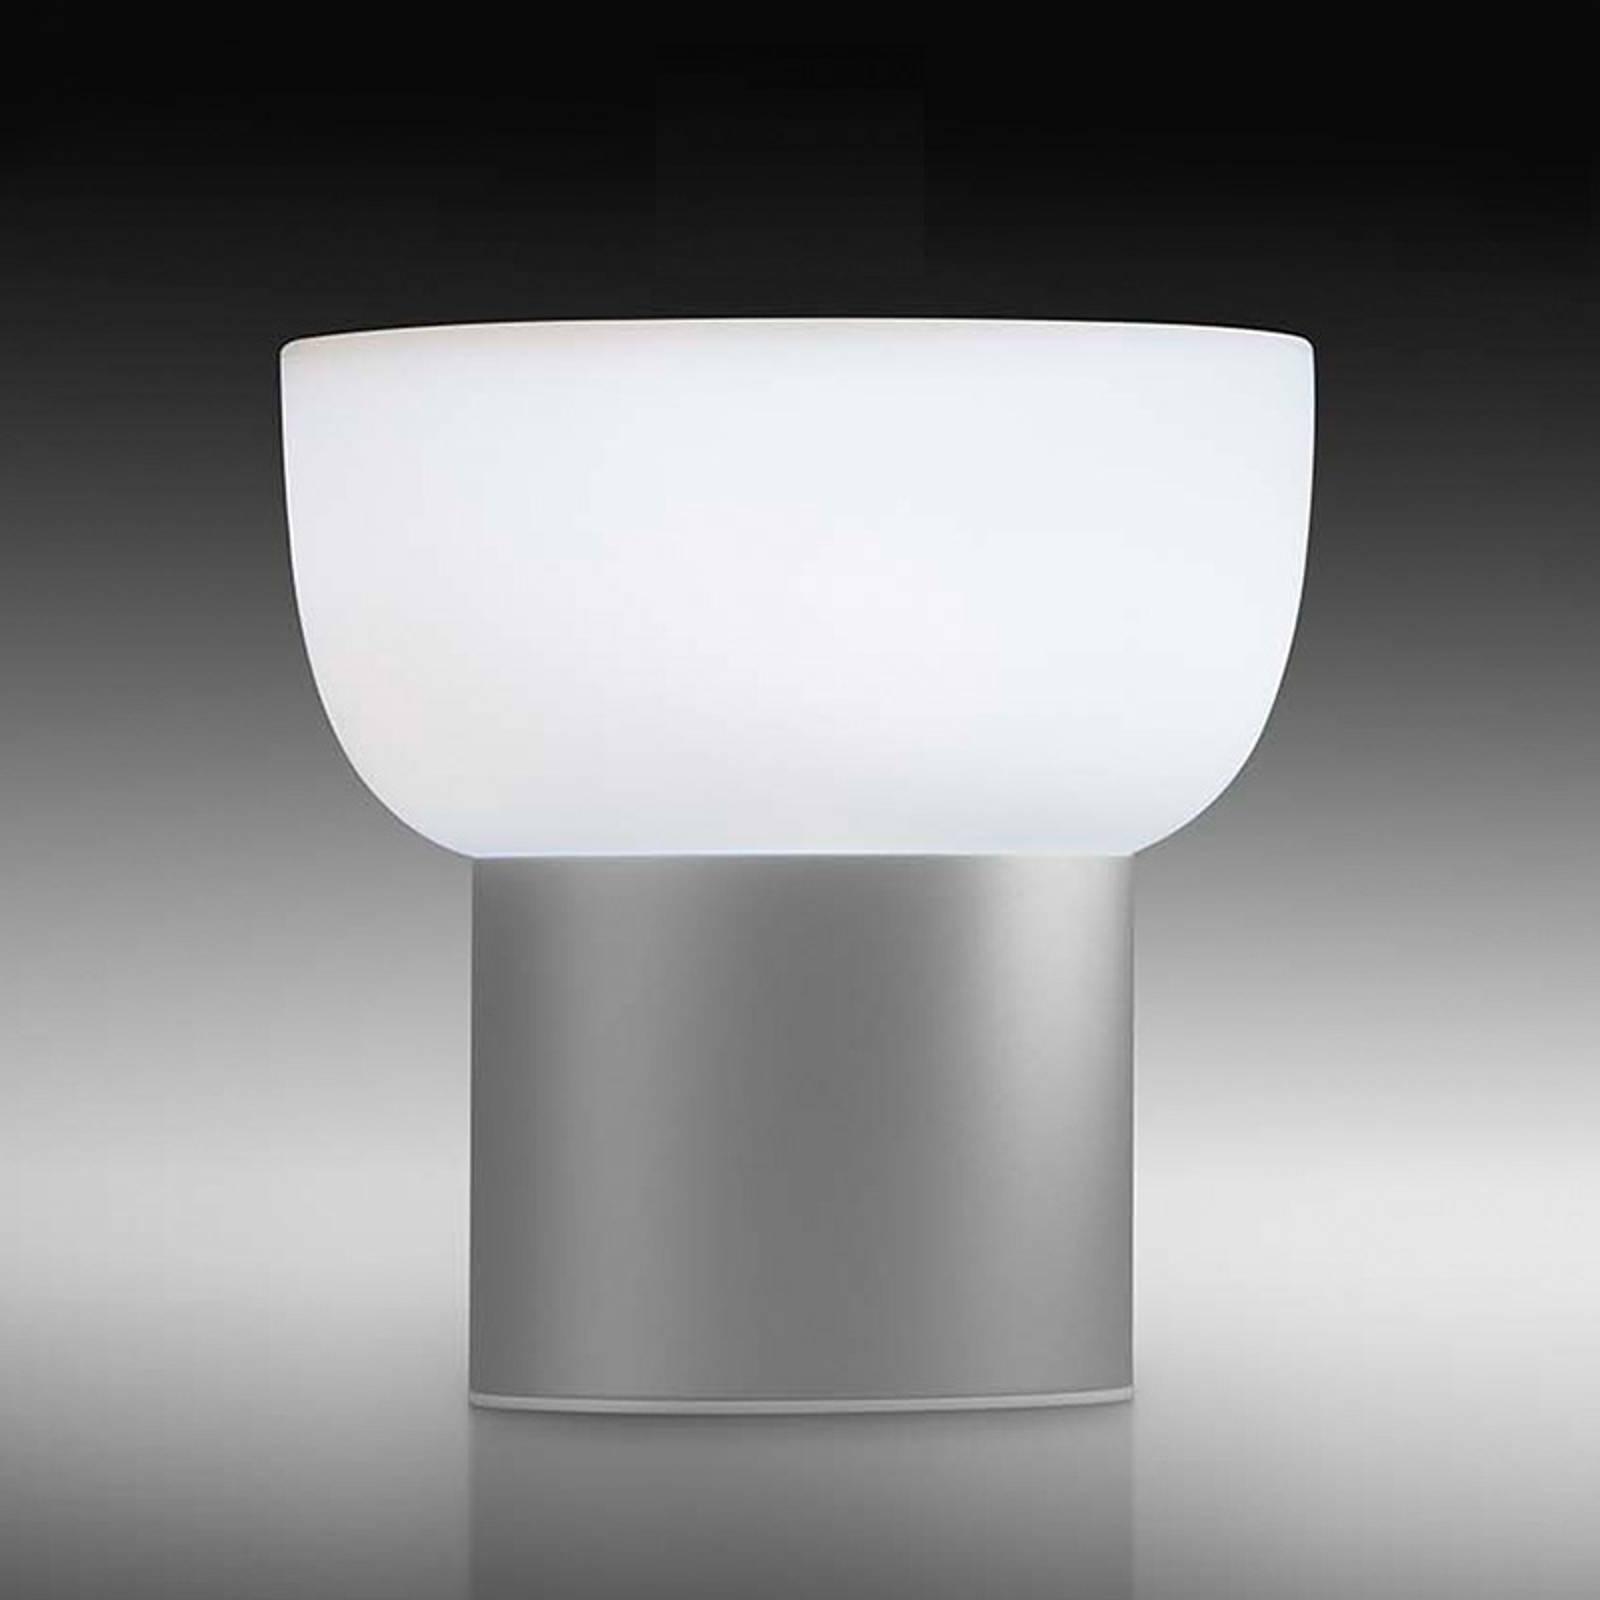 Lampada LED esterni Patio, argento, 16 cm